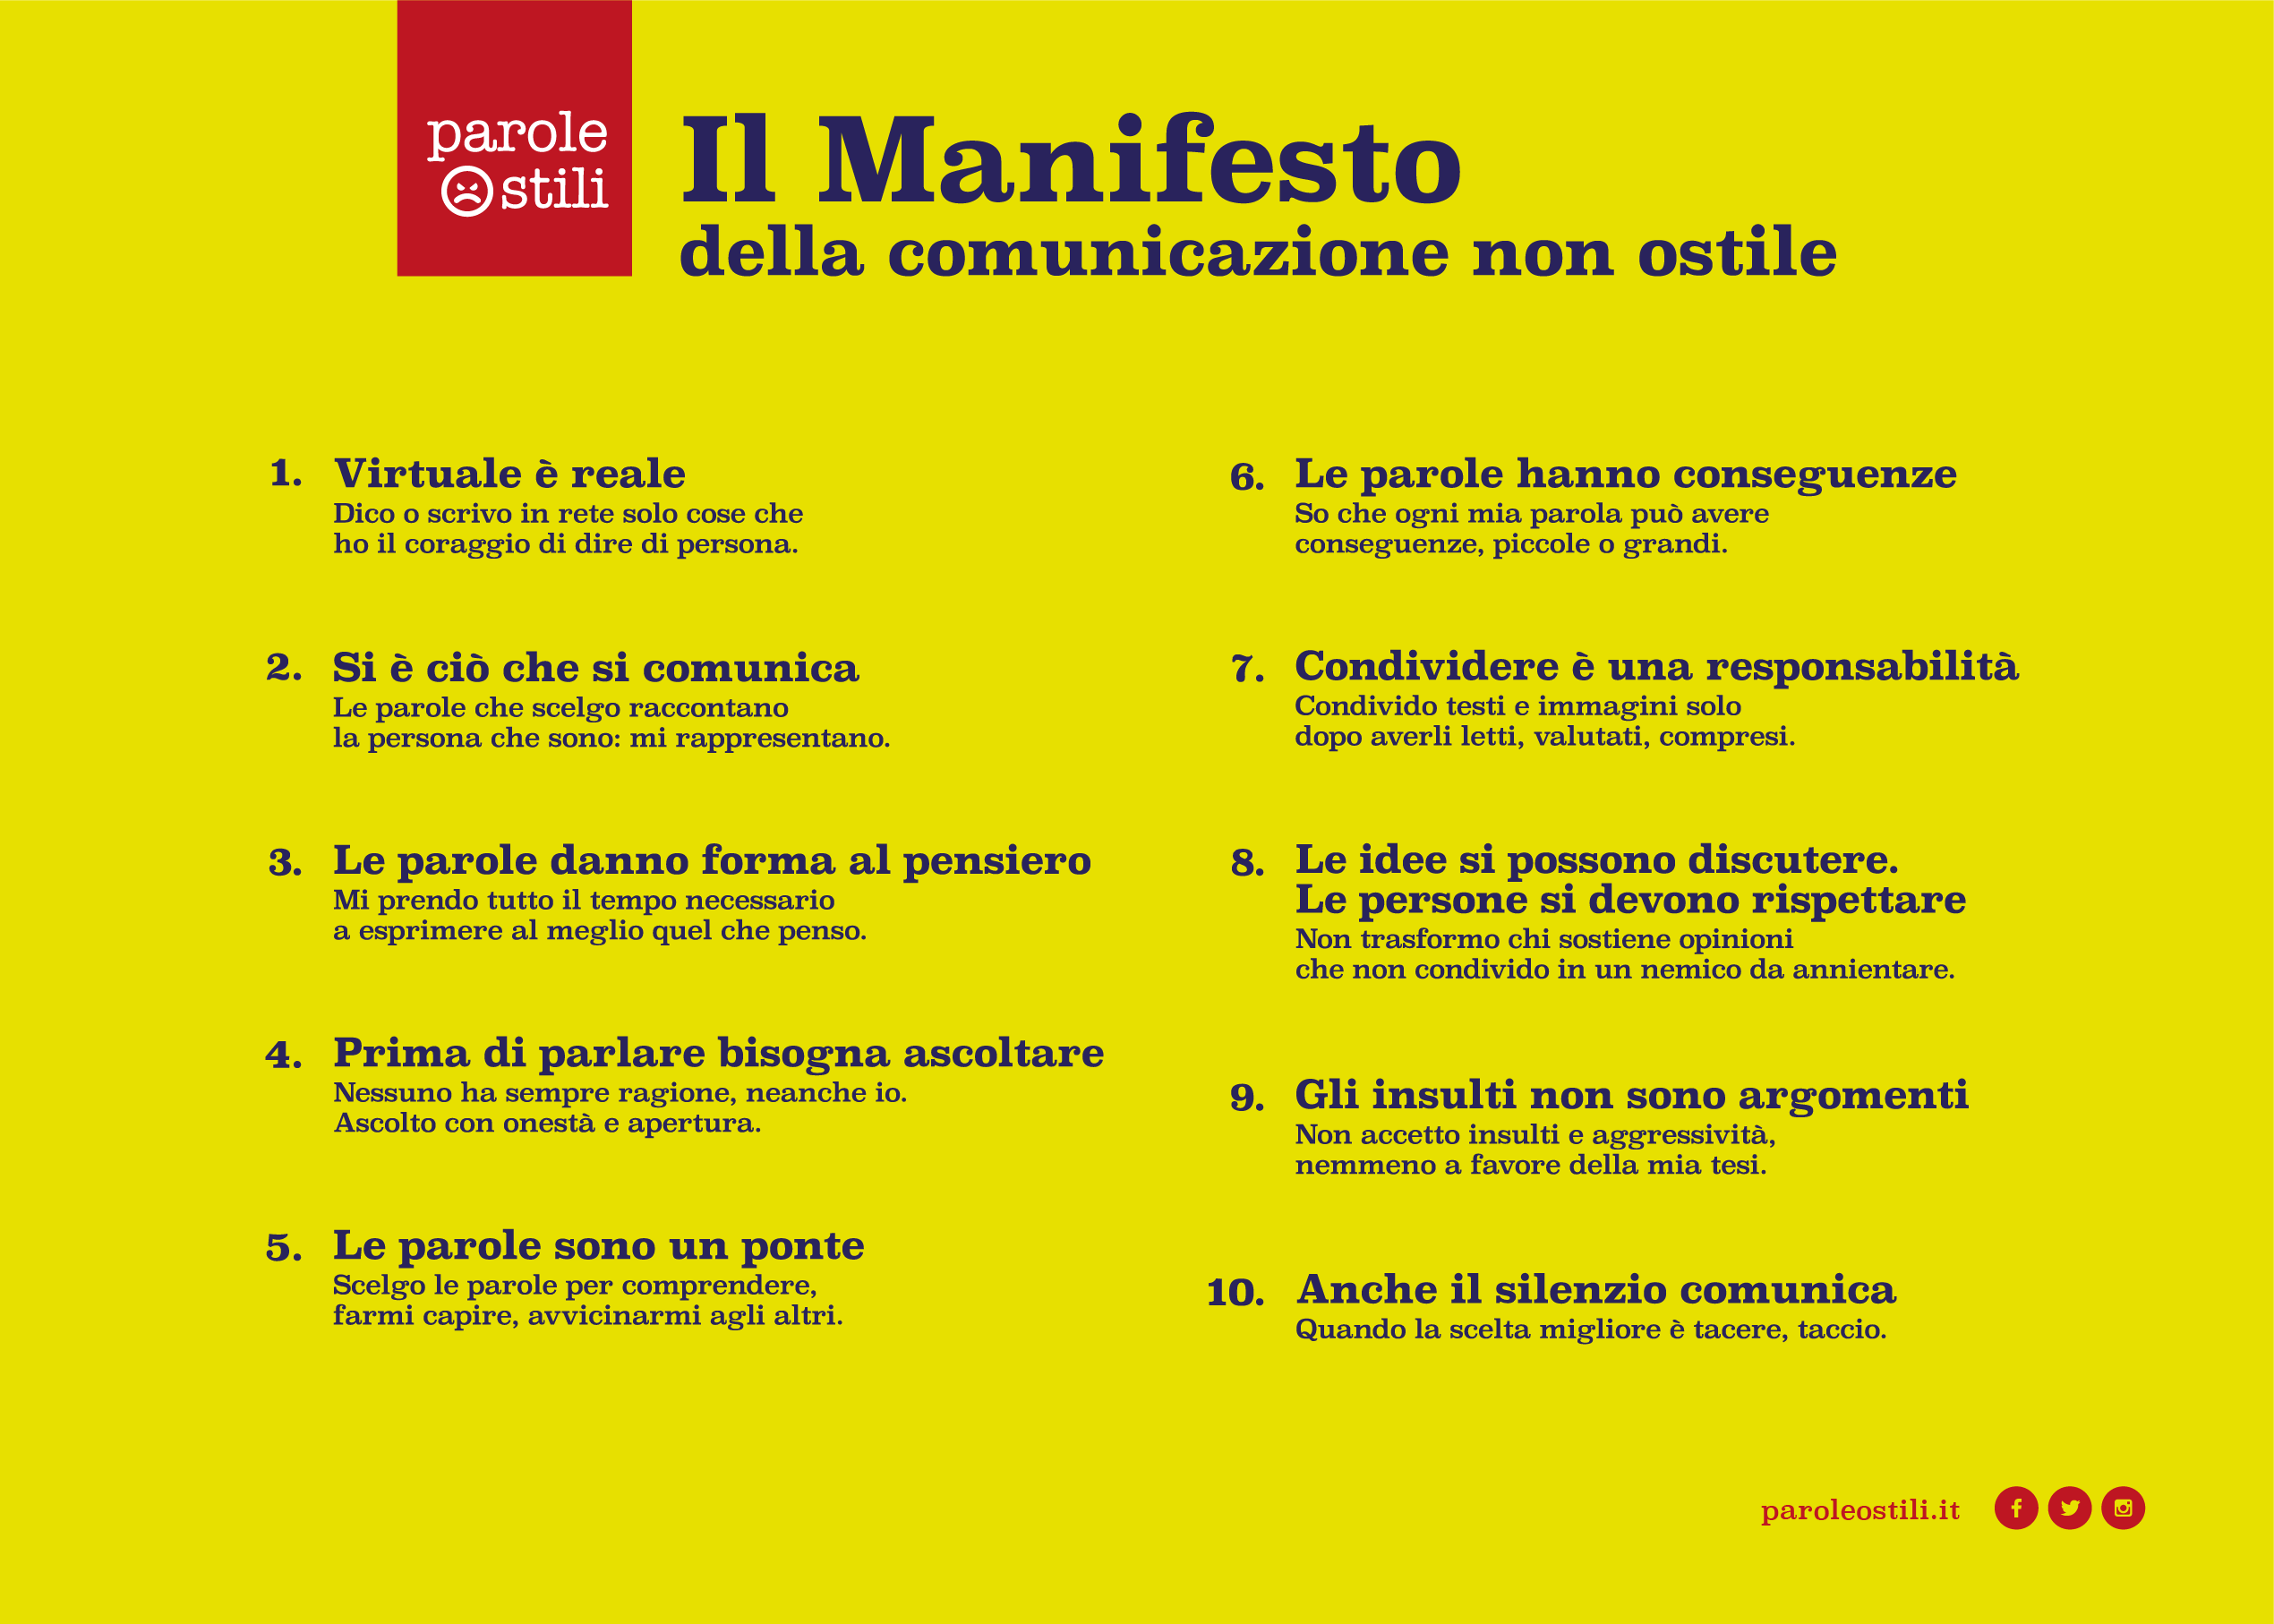 Manifesto Image: Osservatorio Cyberbullismo